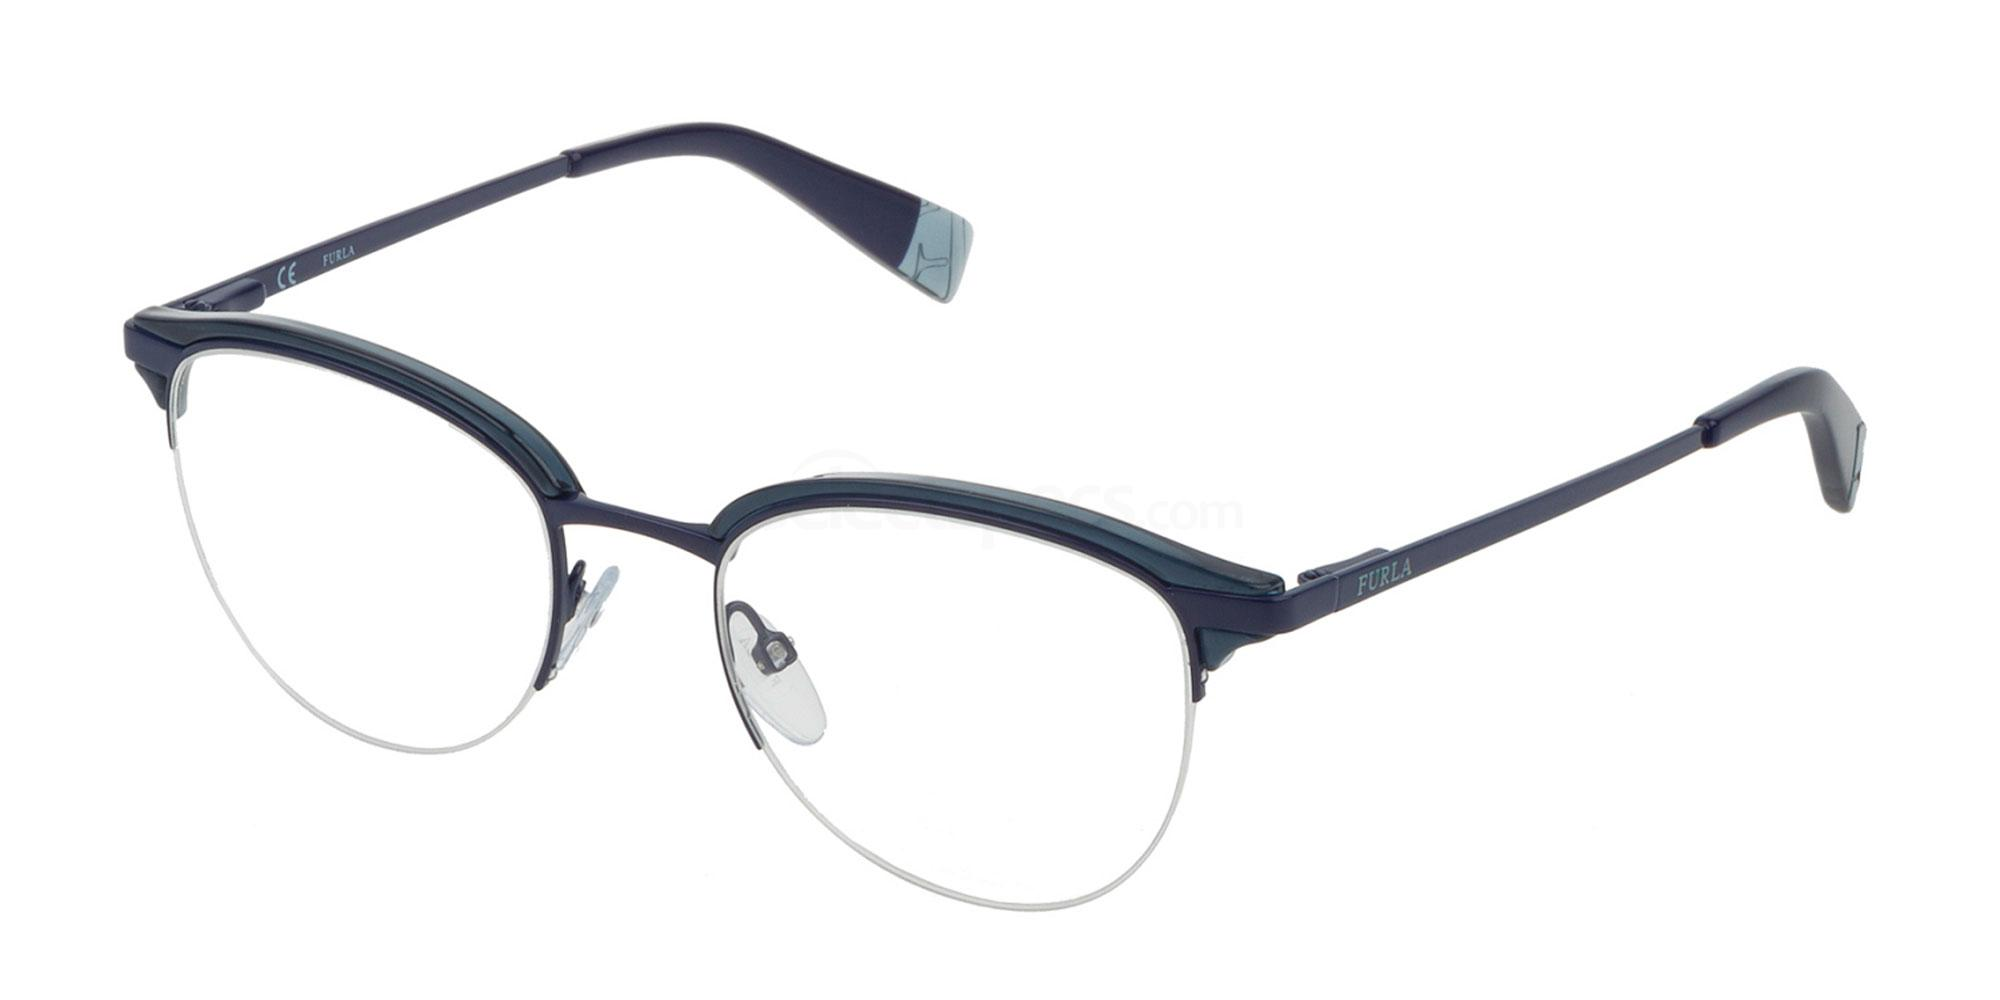 01HR VFU185 Glasses, Furla